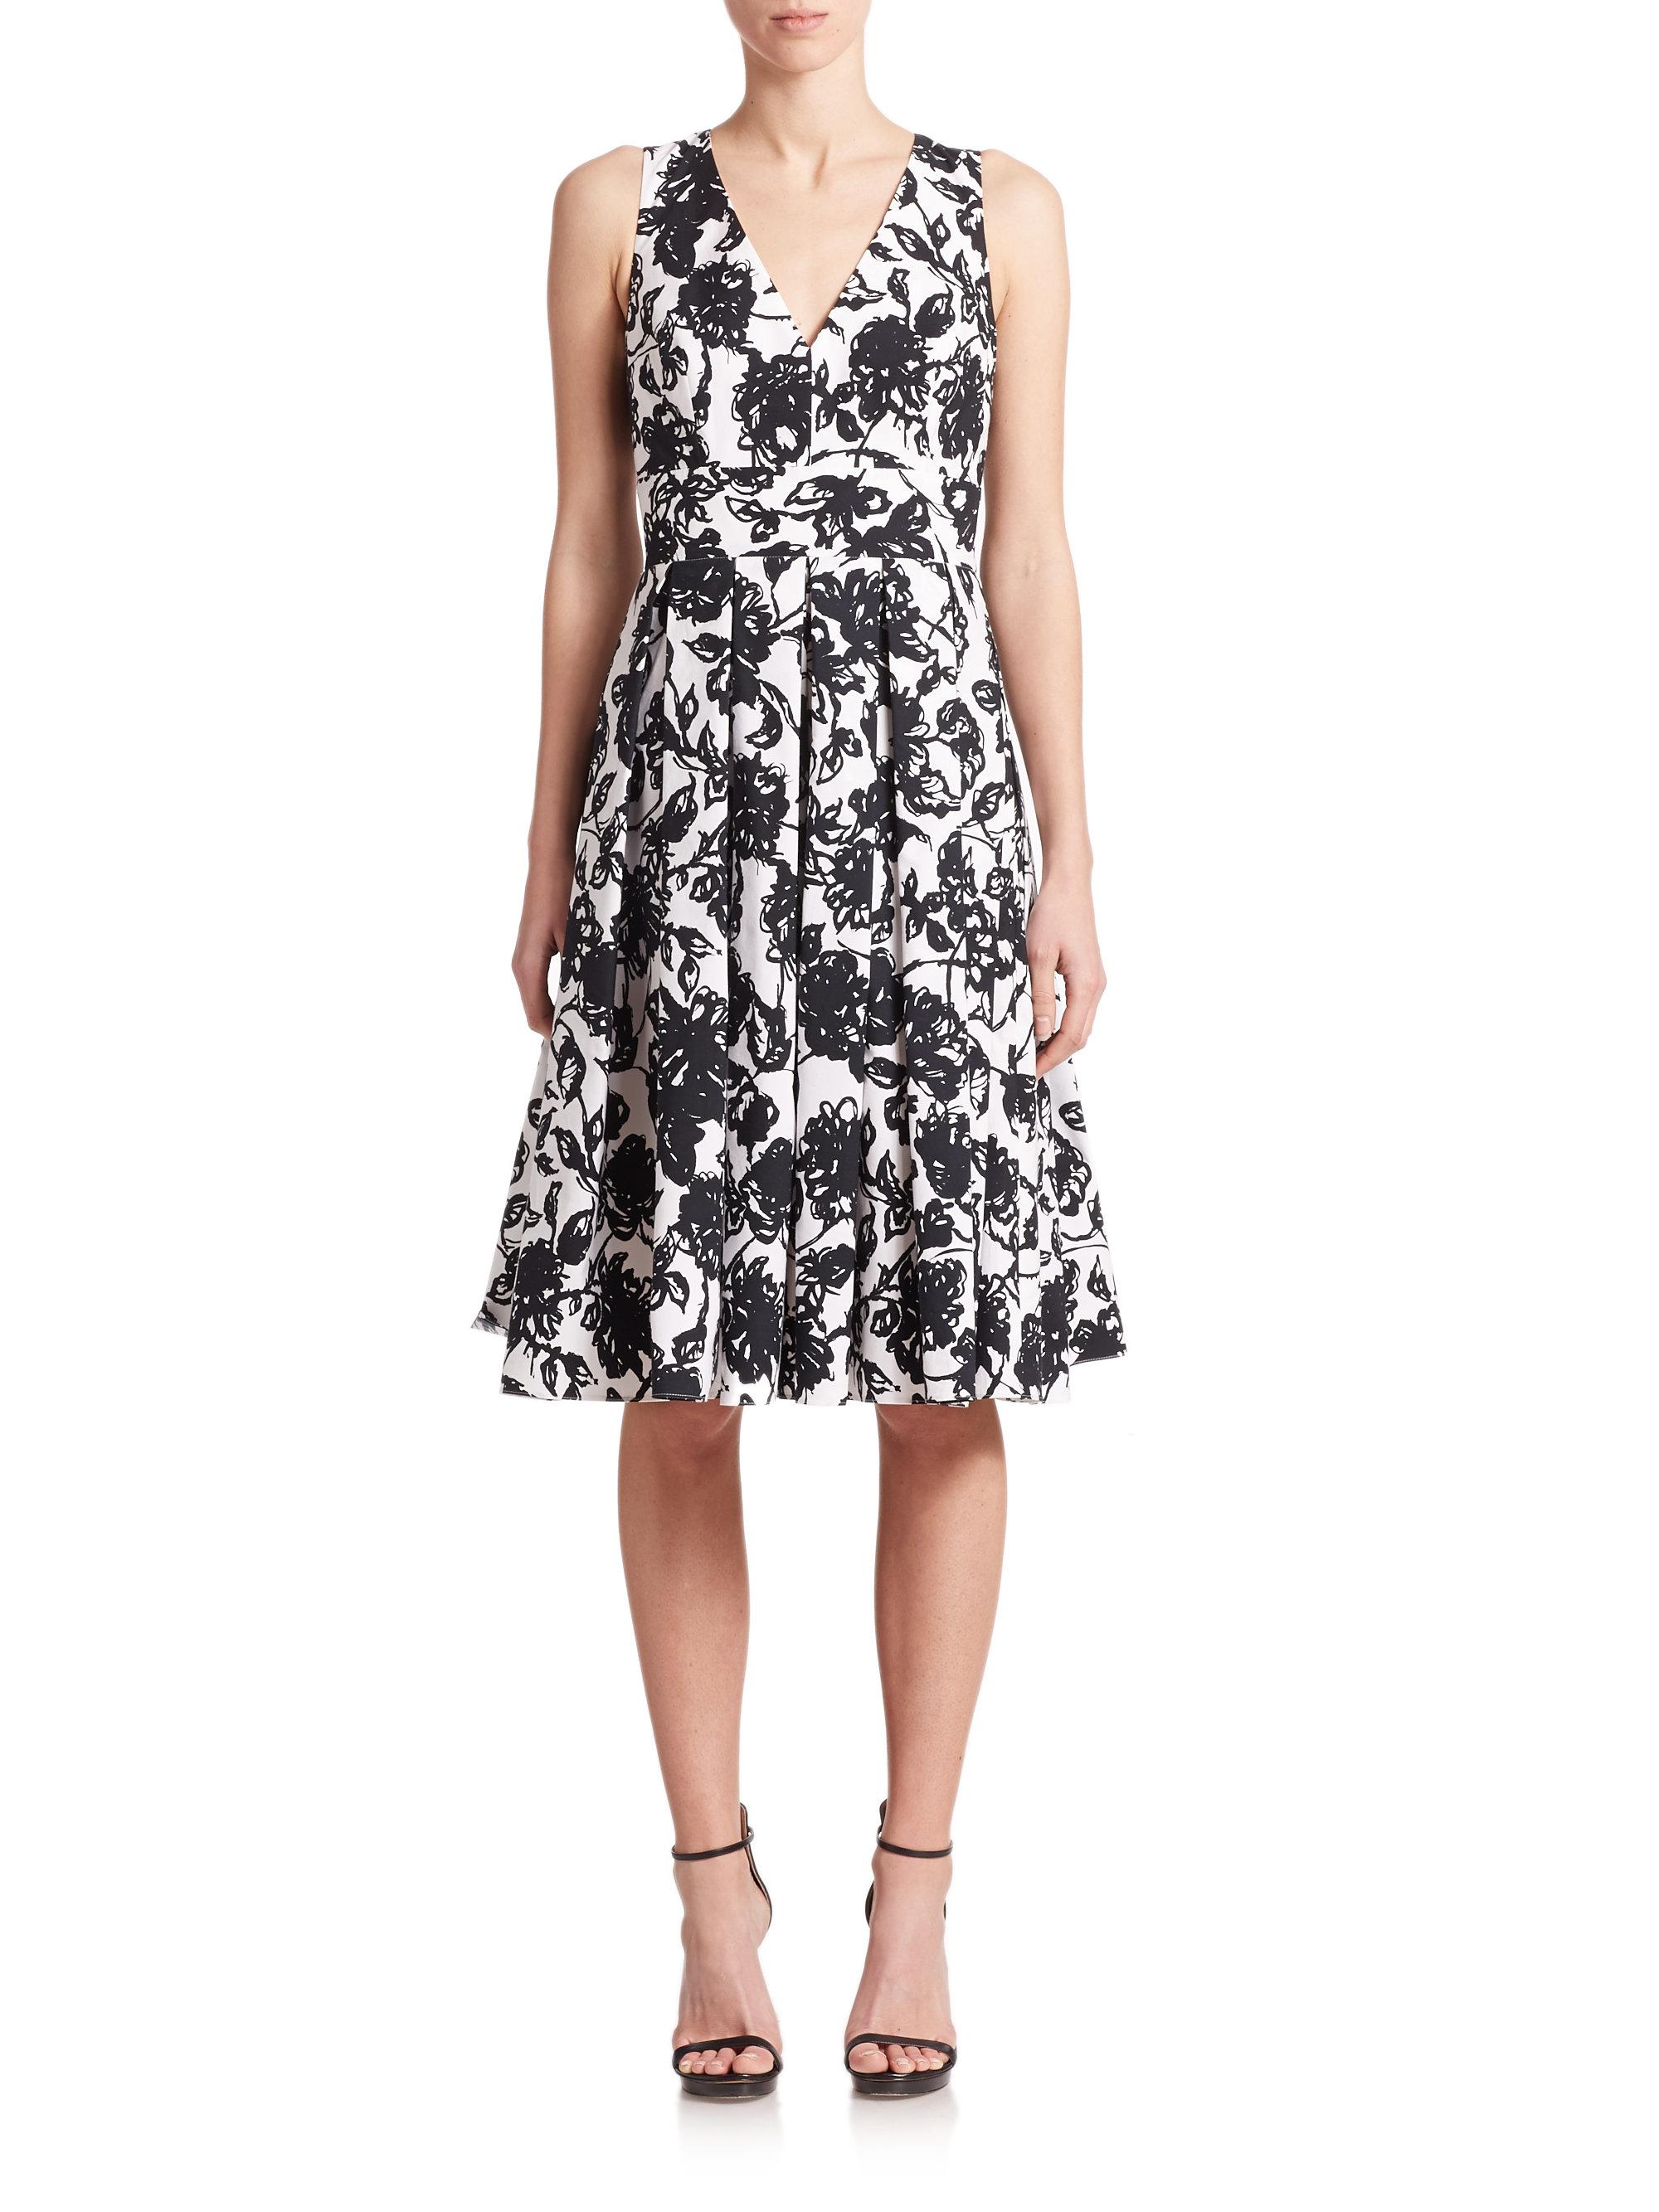 Michael Kors Cotton Floral Print Bell Skirt Midi Dress In